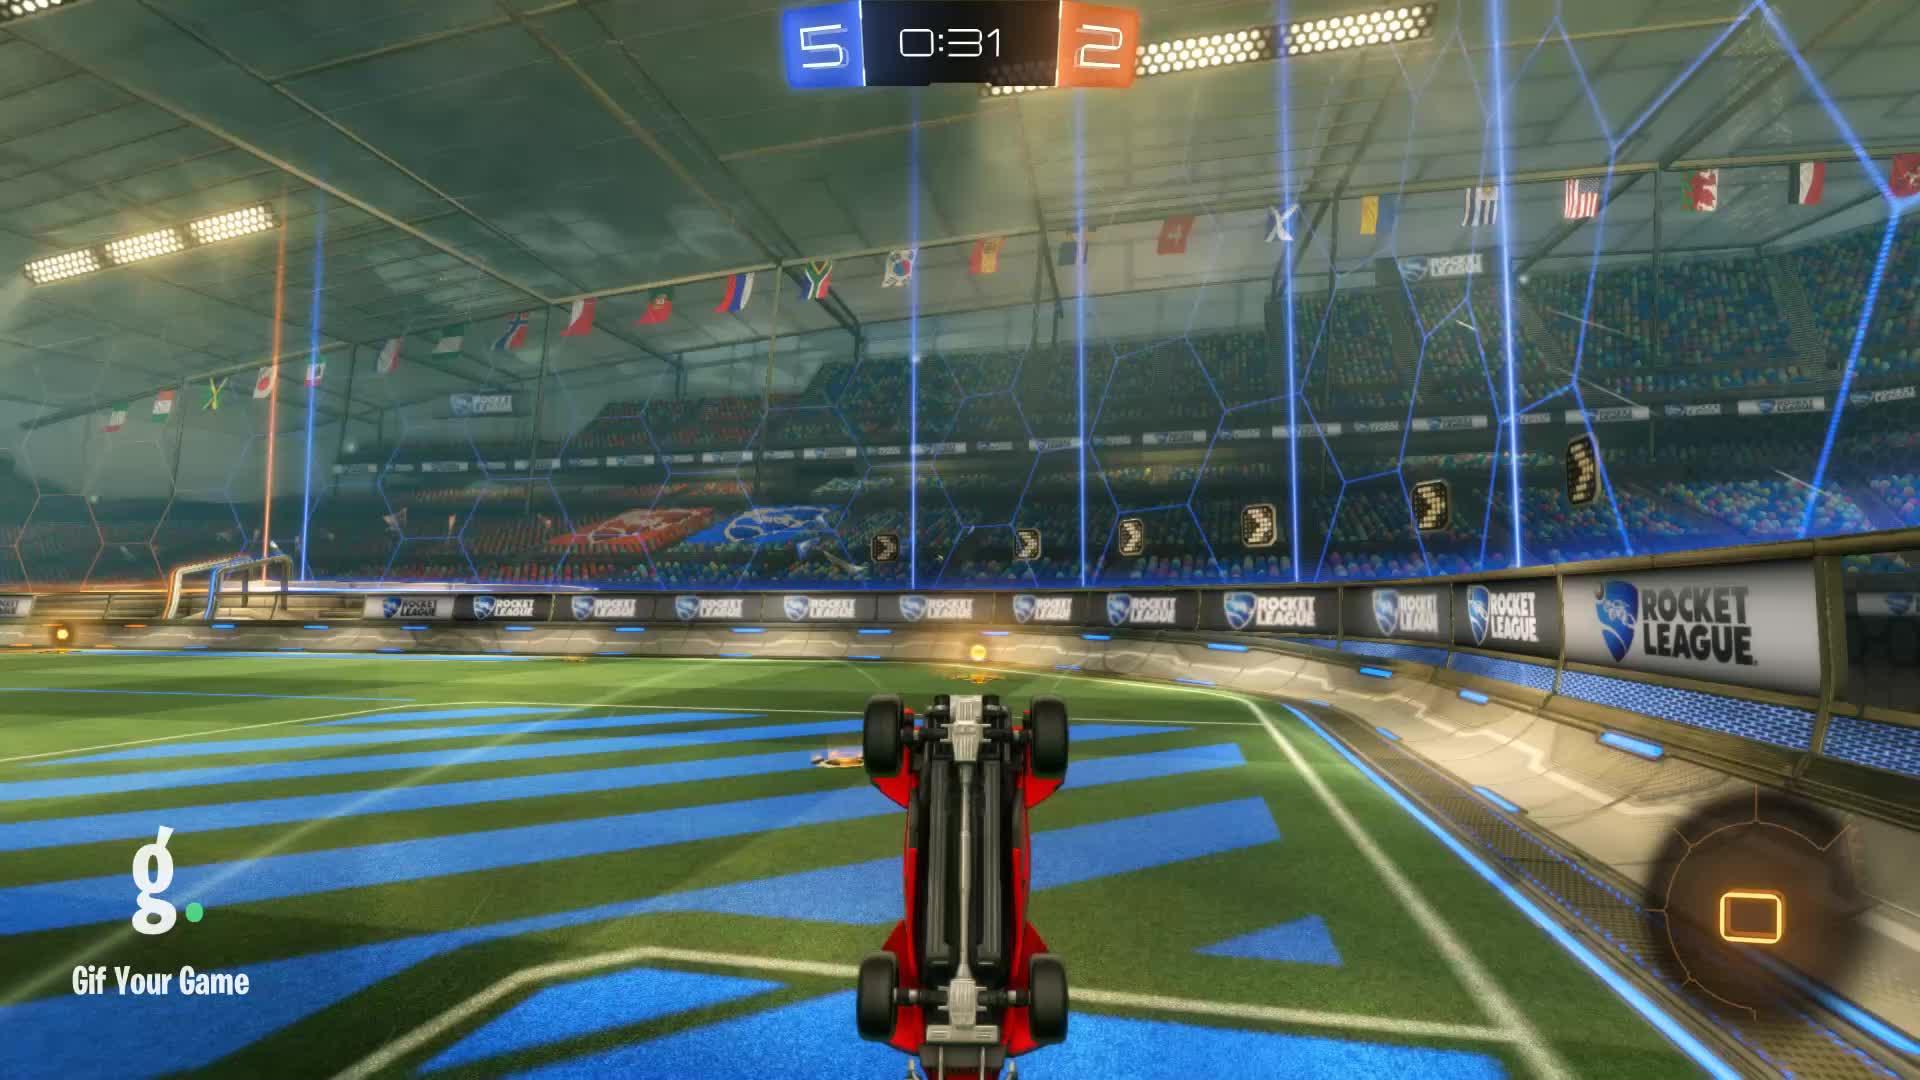 Gif Your Game, GifYourGame, Goal, Rocket League, RocketLeague, datboi, Goal 8: datboi GIFs